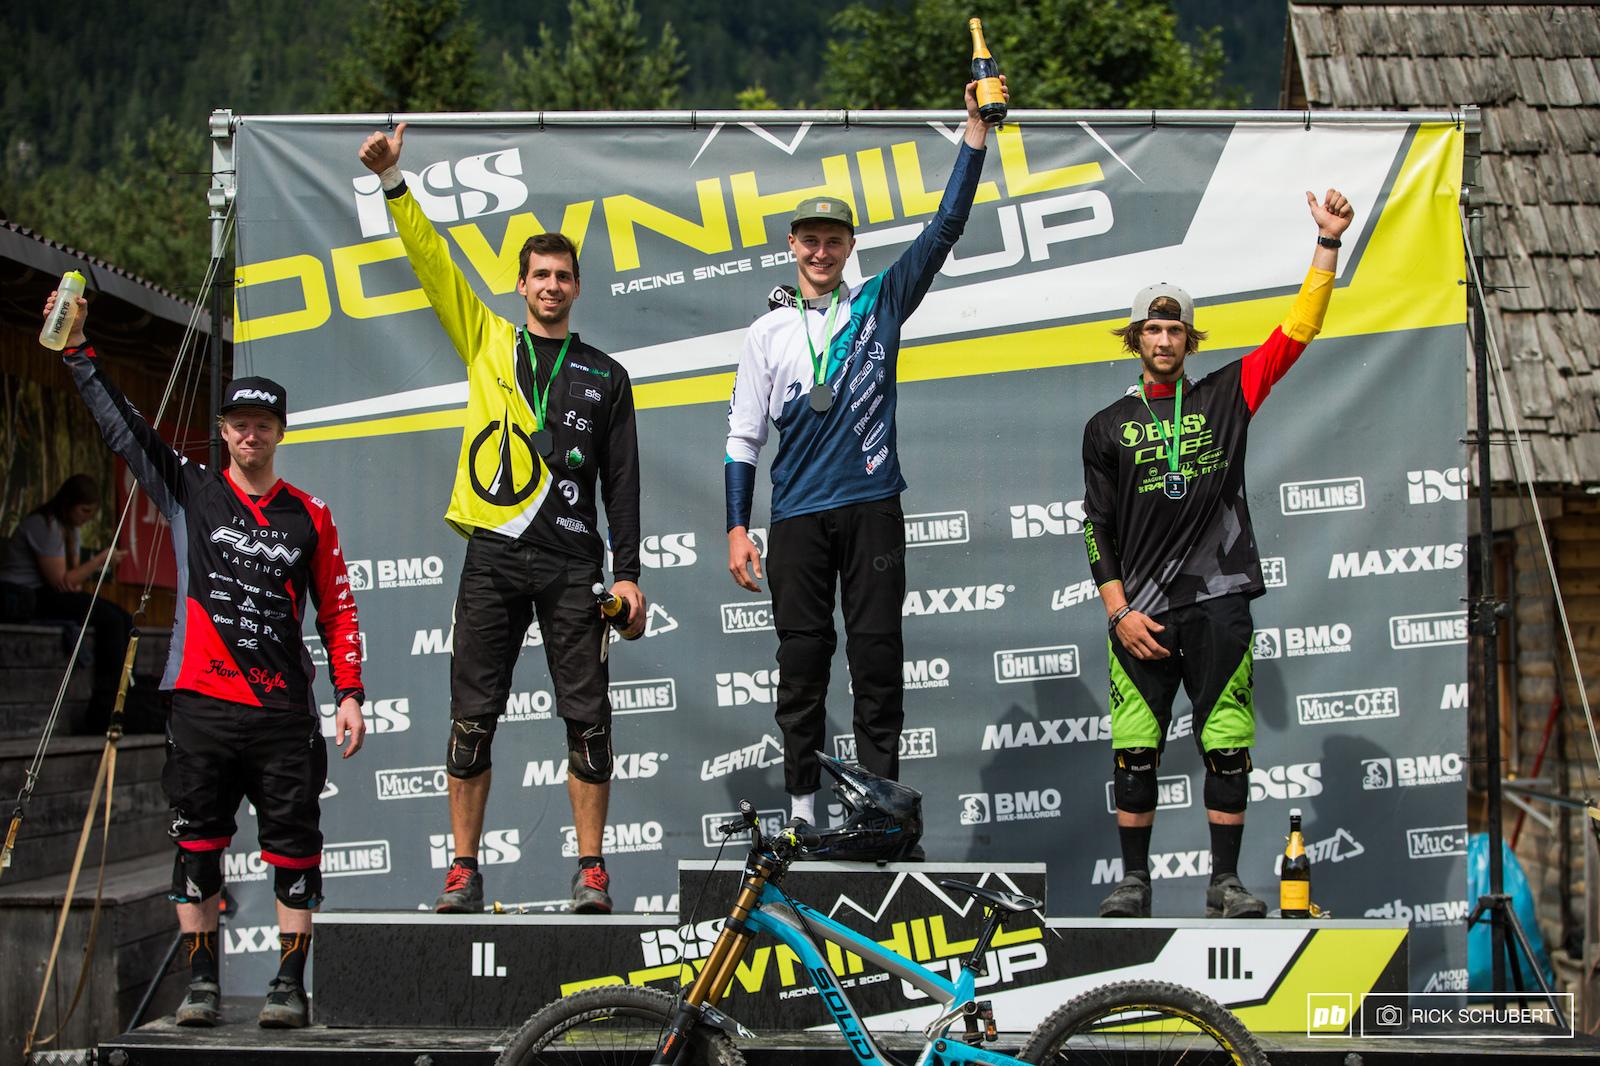 Elite men podium with Bryn Dickerson Luka Berginc Joshua Barth and Max Hartenstern